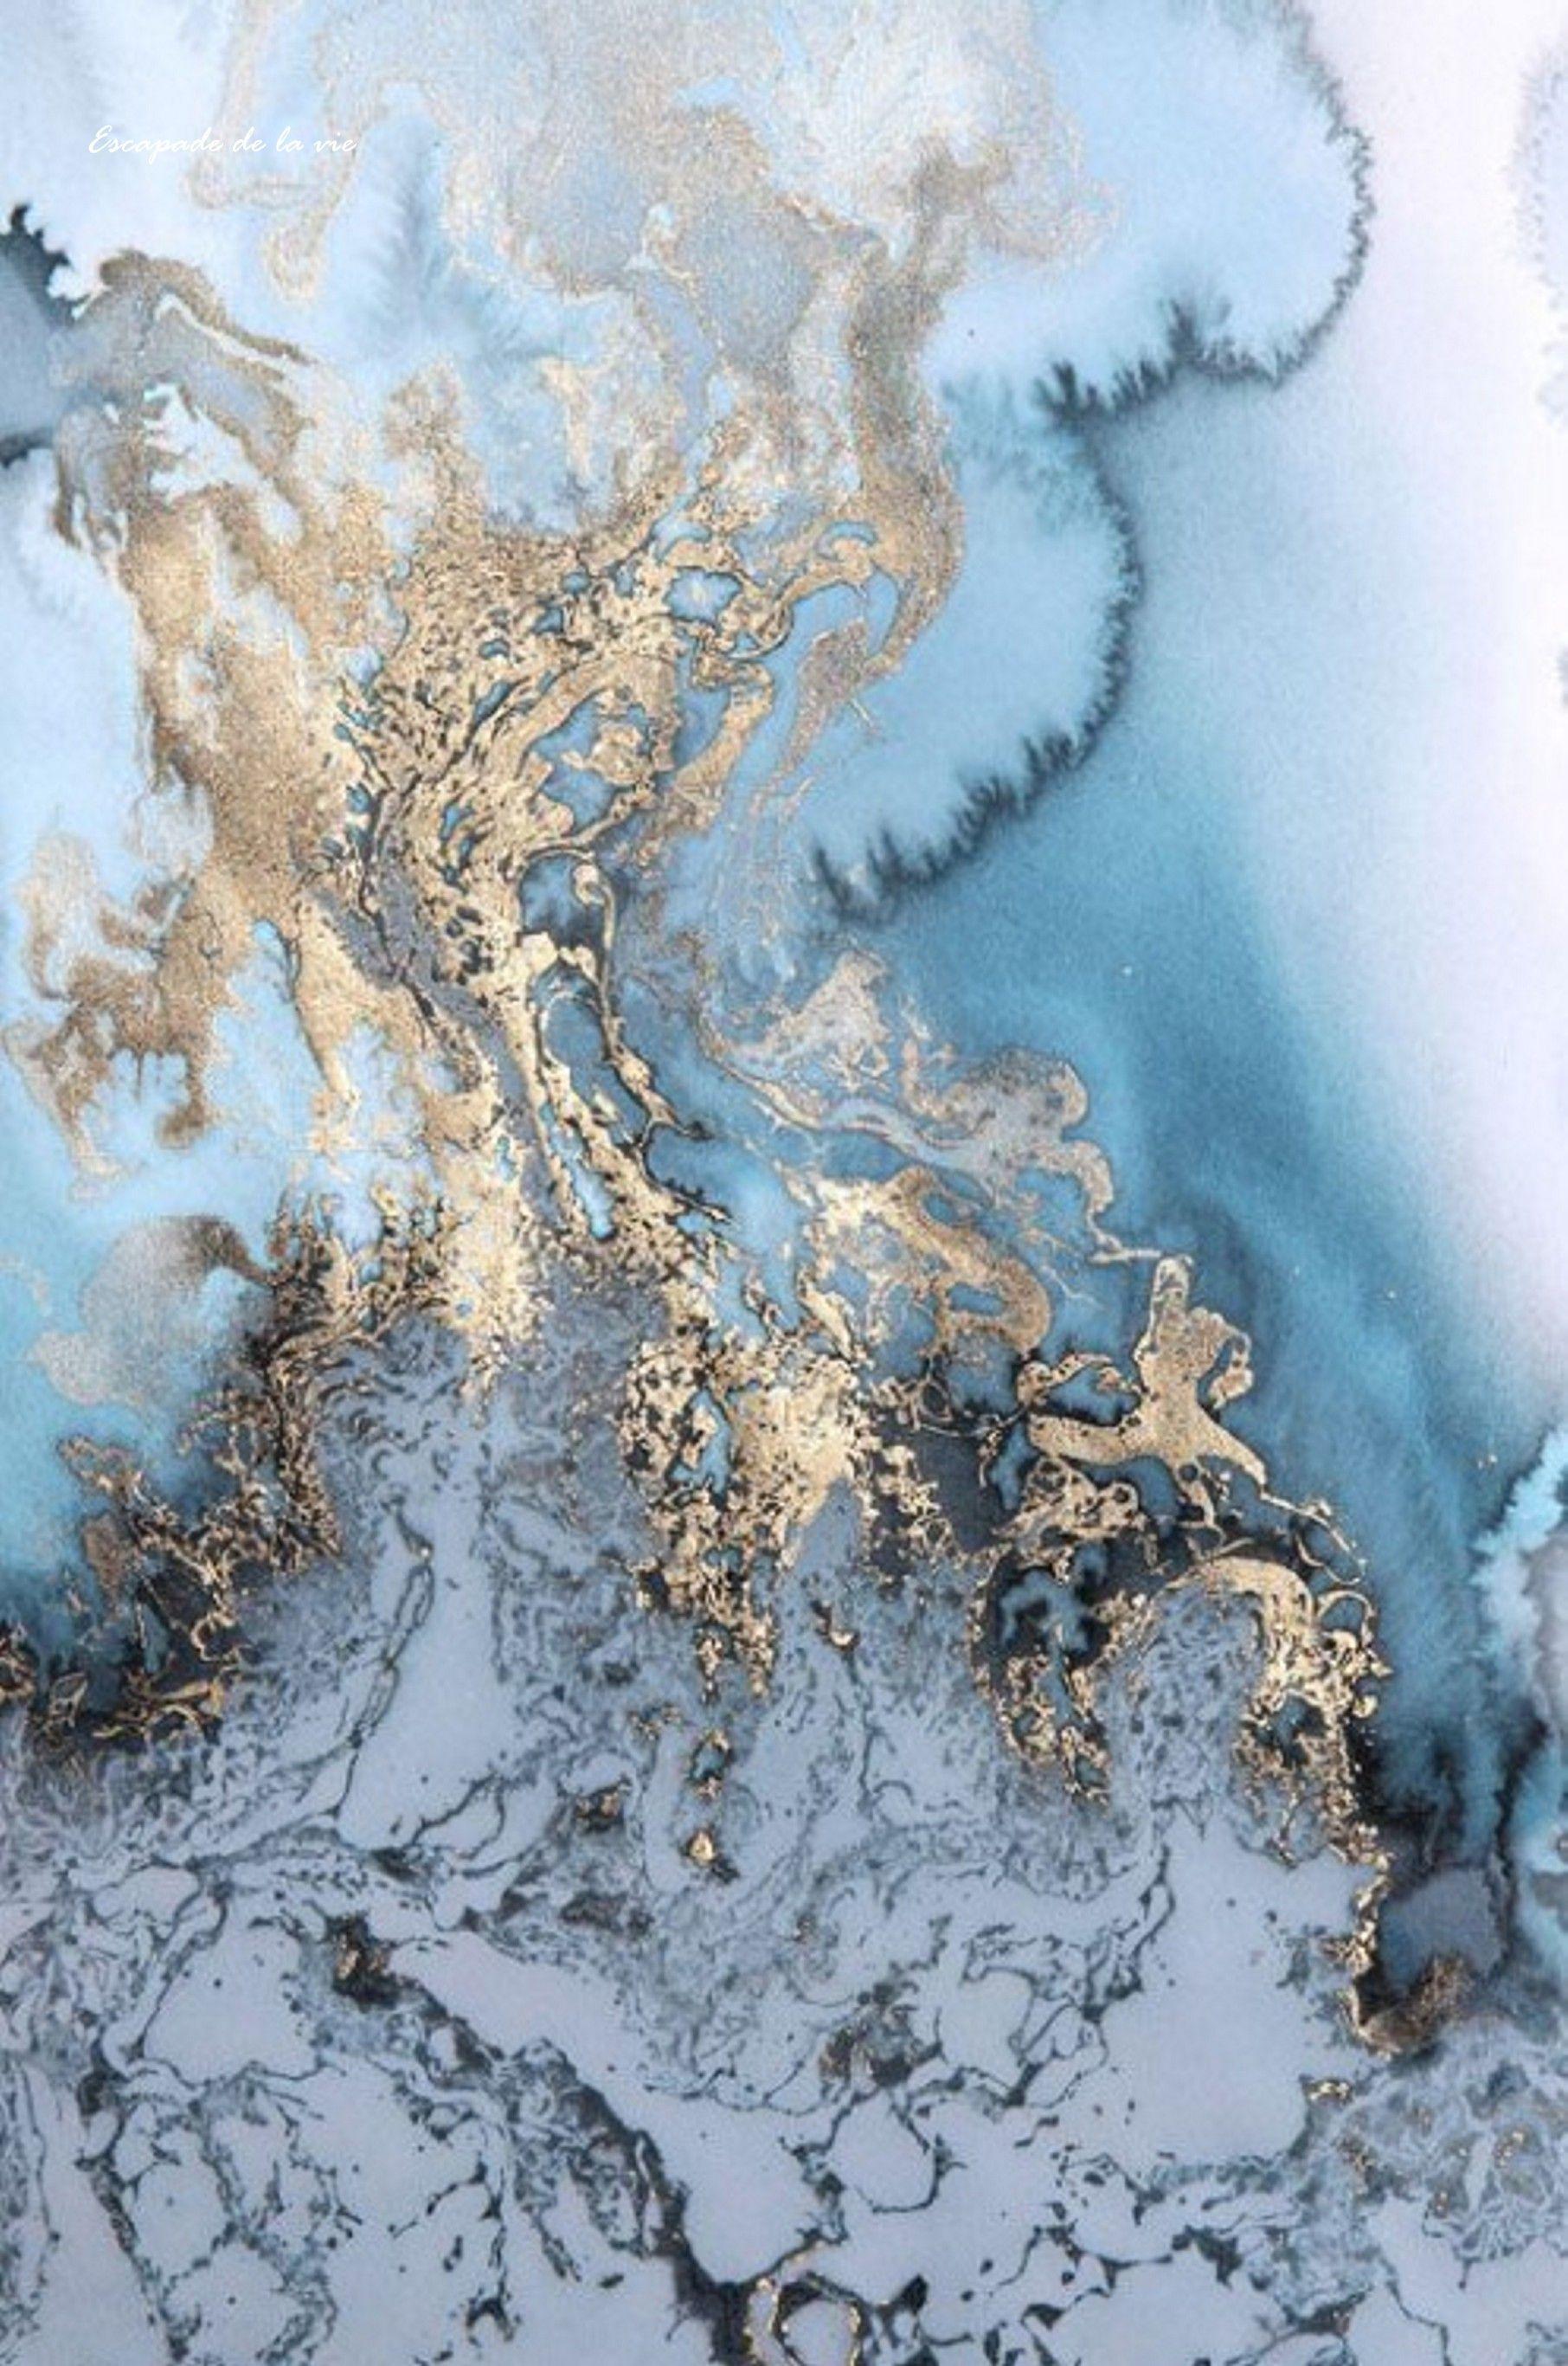 Popular Wallpaper Marble Ios - 6e71008872e08d4149dae99663da6828  Snapshot_526039.jpg